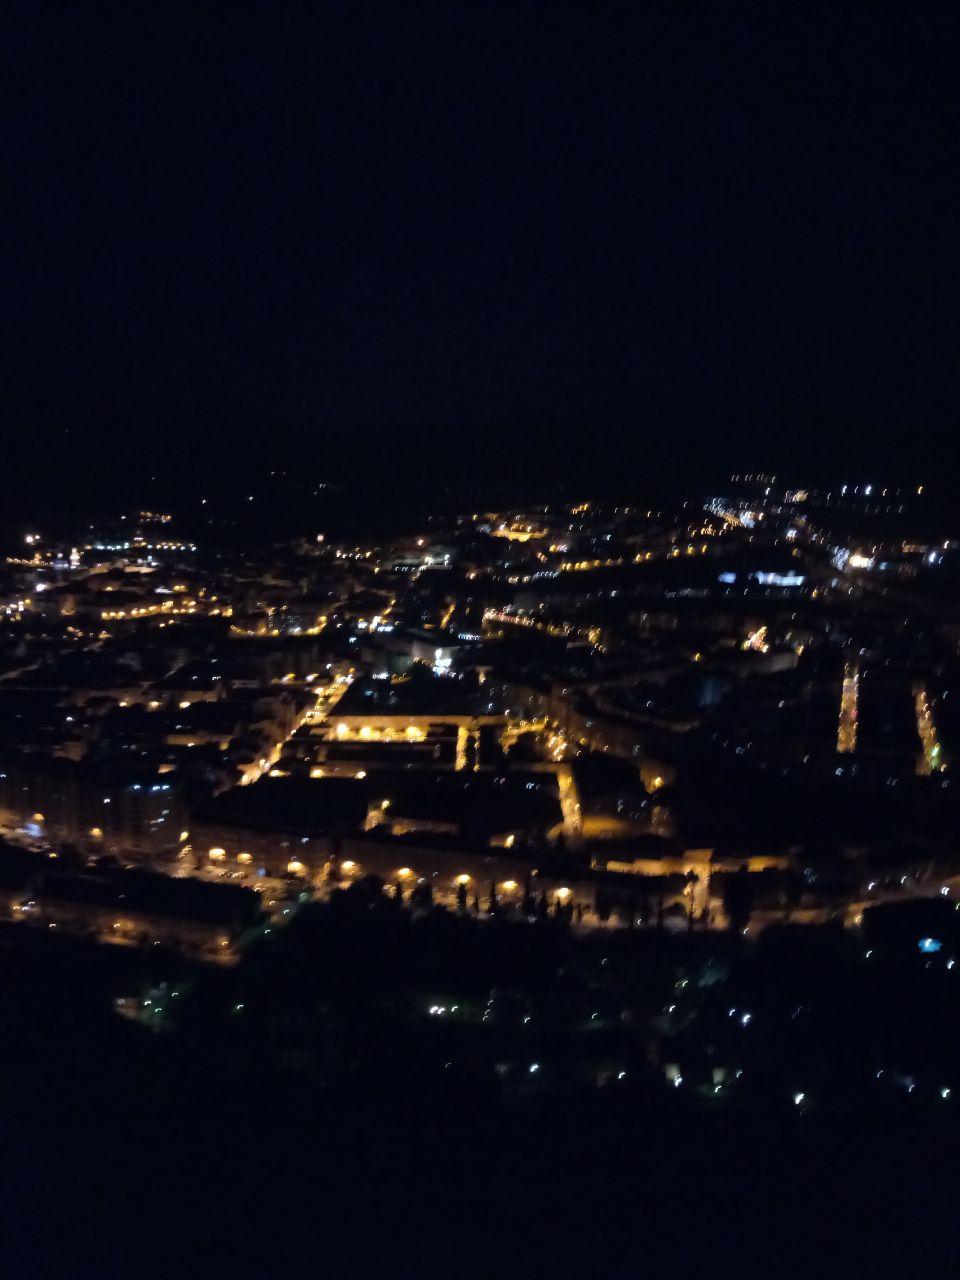 Foto nocturna con el Alcatel A7 foto de noche